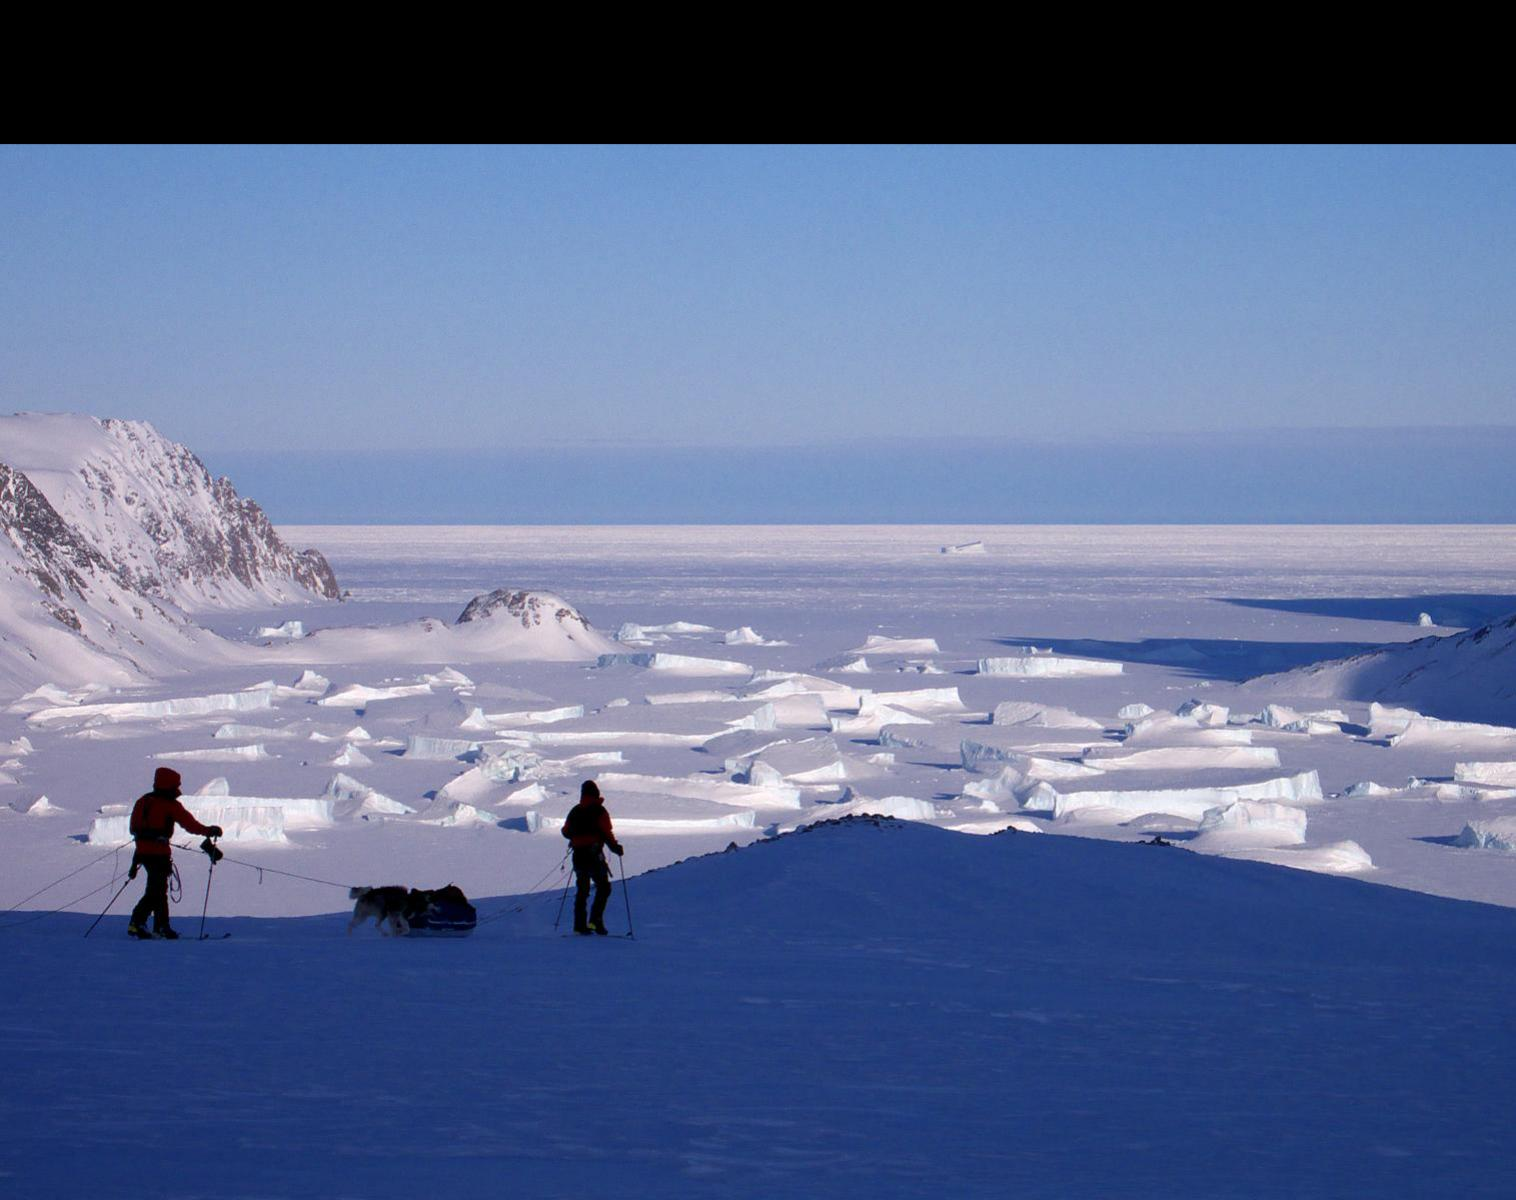 Groenland  Groenland: Expédition polaire en terre de Liverpool   Ski & Pulka